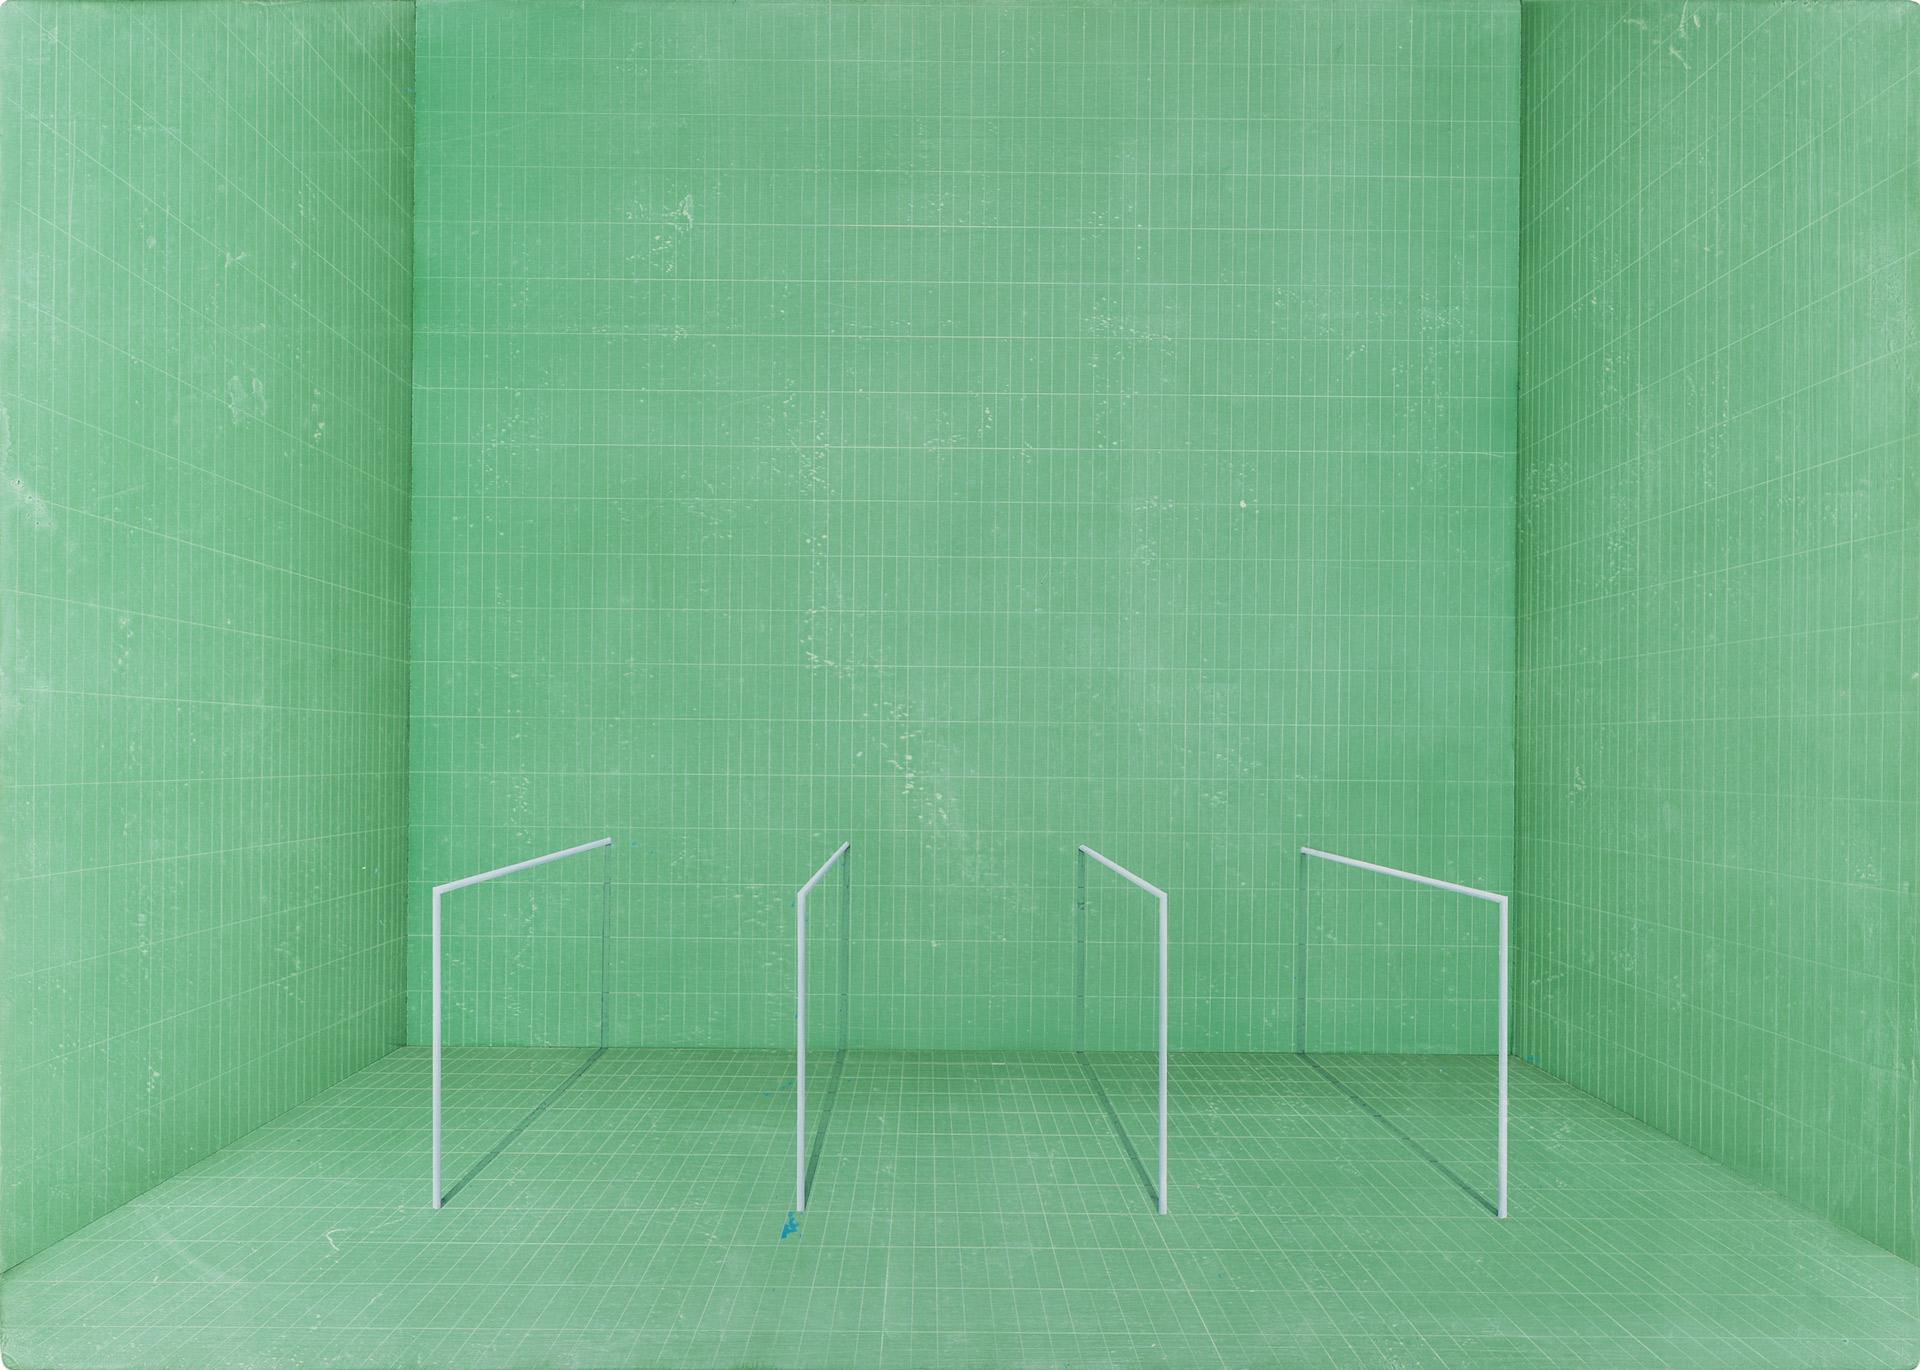 Untitled/50 x 70 cm, Oil on wood/2019